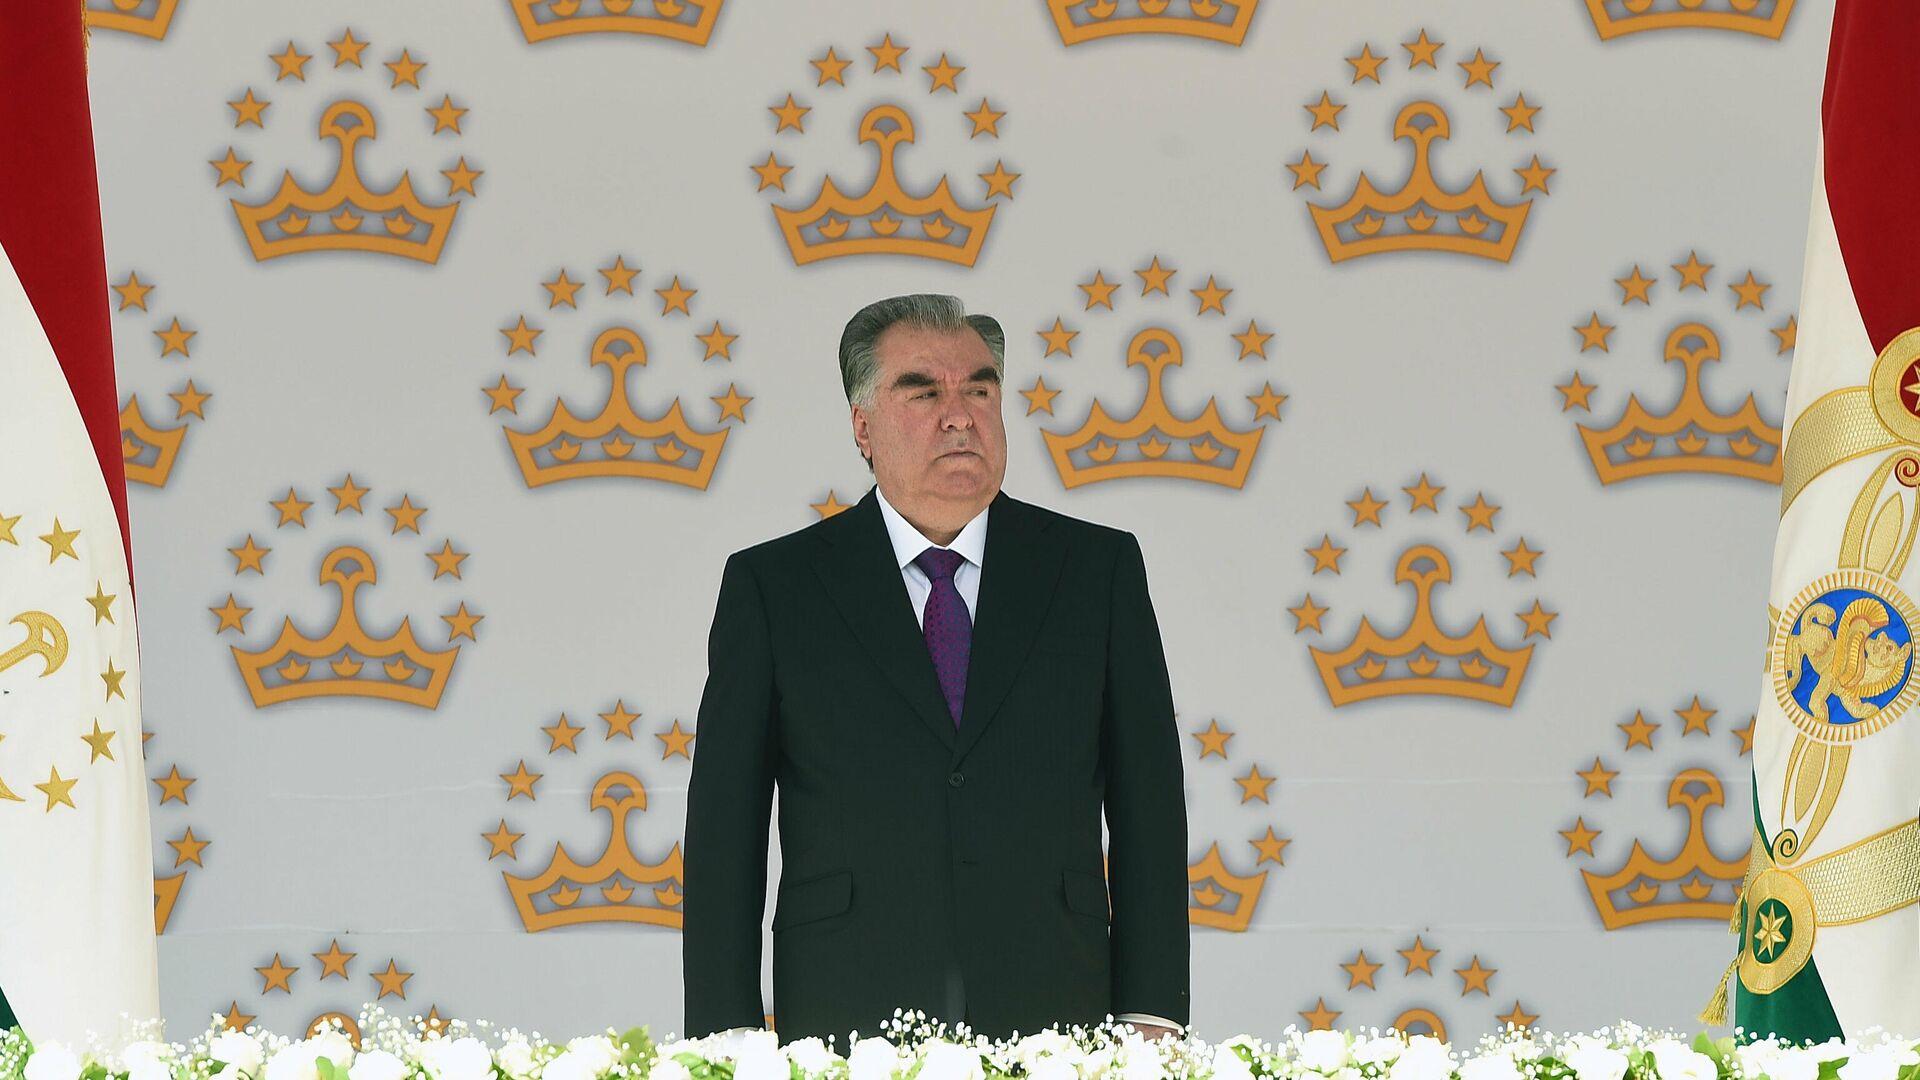 Президент Республики Таджикистан Эмомали Рахмон - Sputnik Тоҷикистон, 1920, 08.09.2021